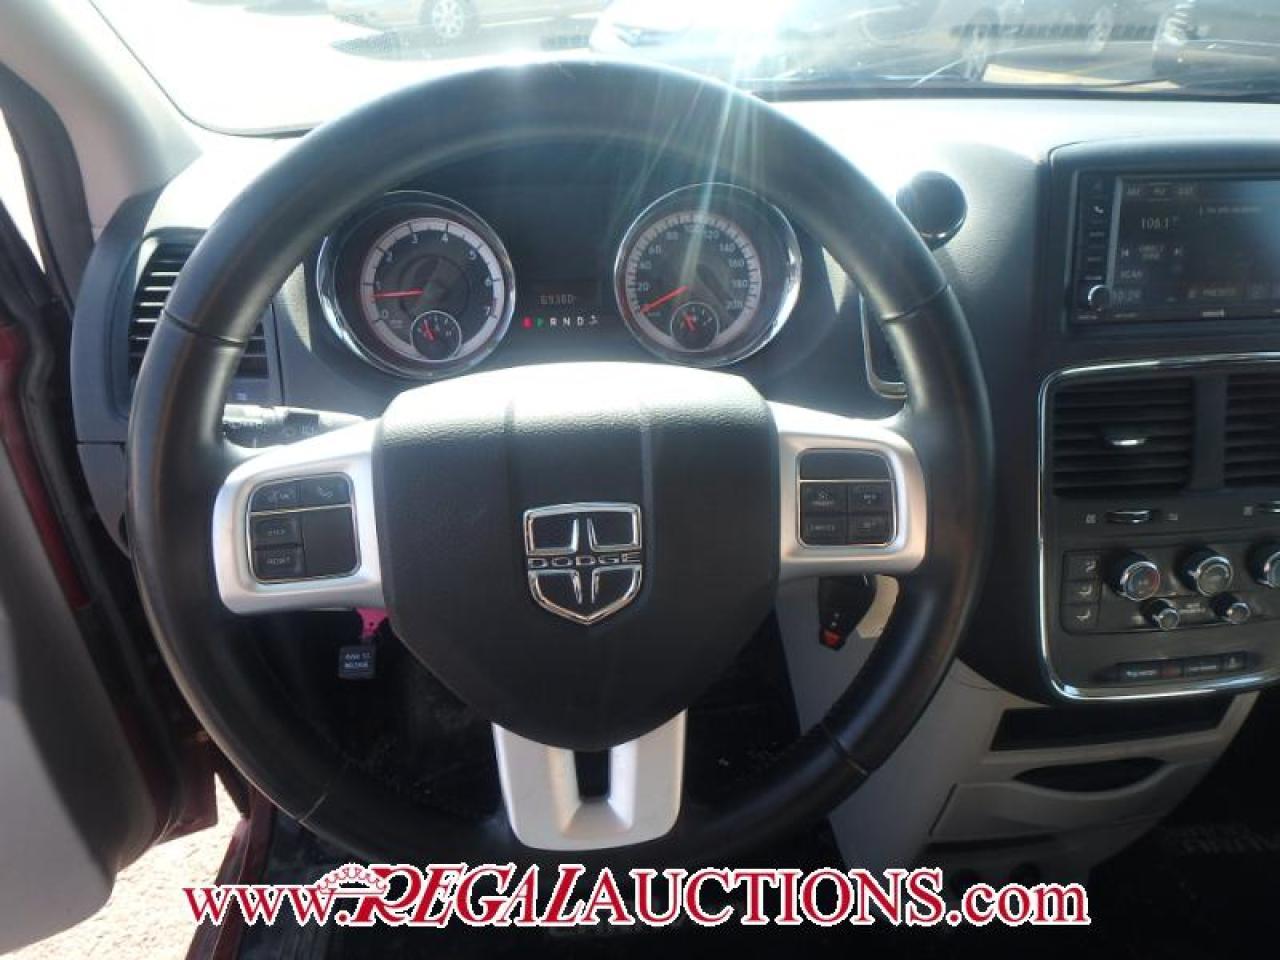 2015 Dodge GRAND CARAVAN SXT WAGON 7PASS 3.6L